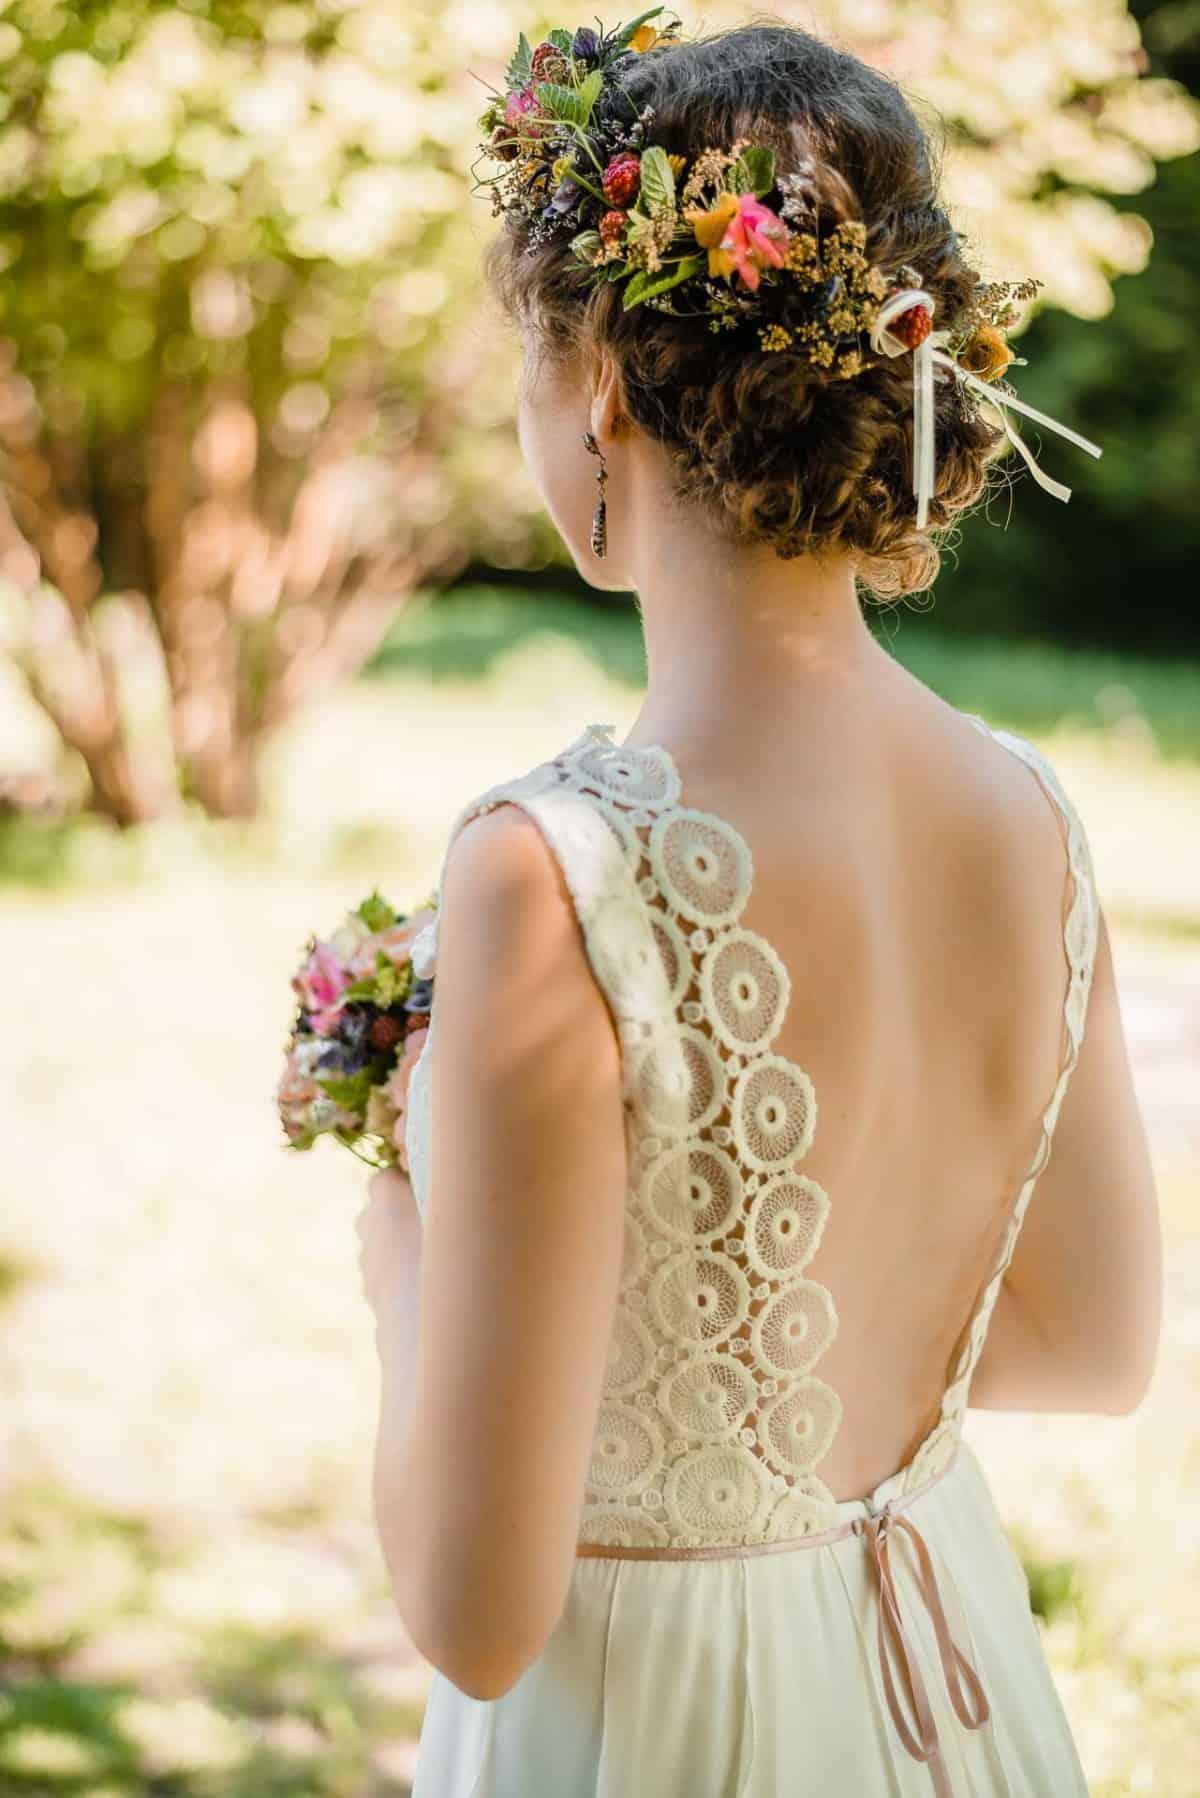 Claudia Heller Brautkleider